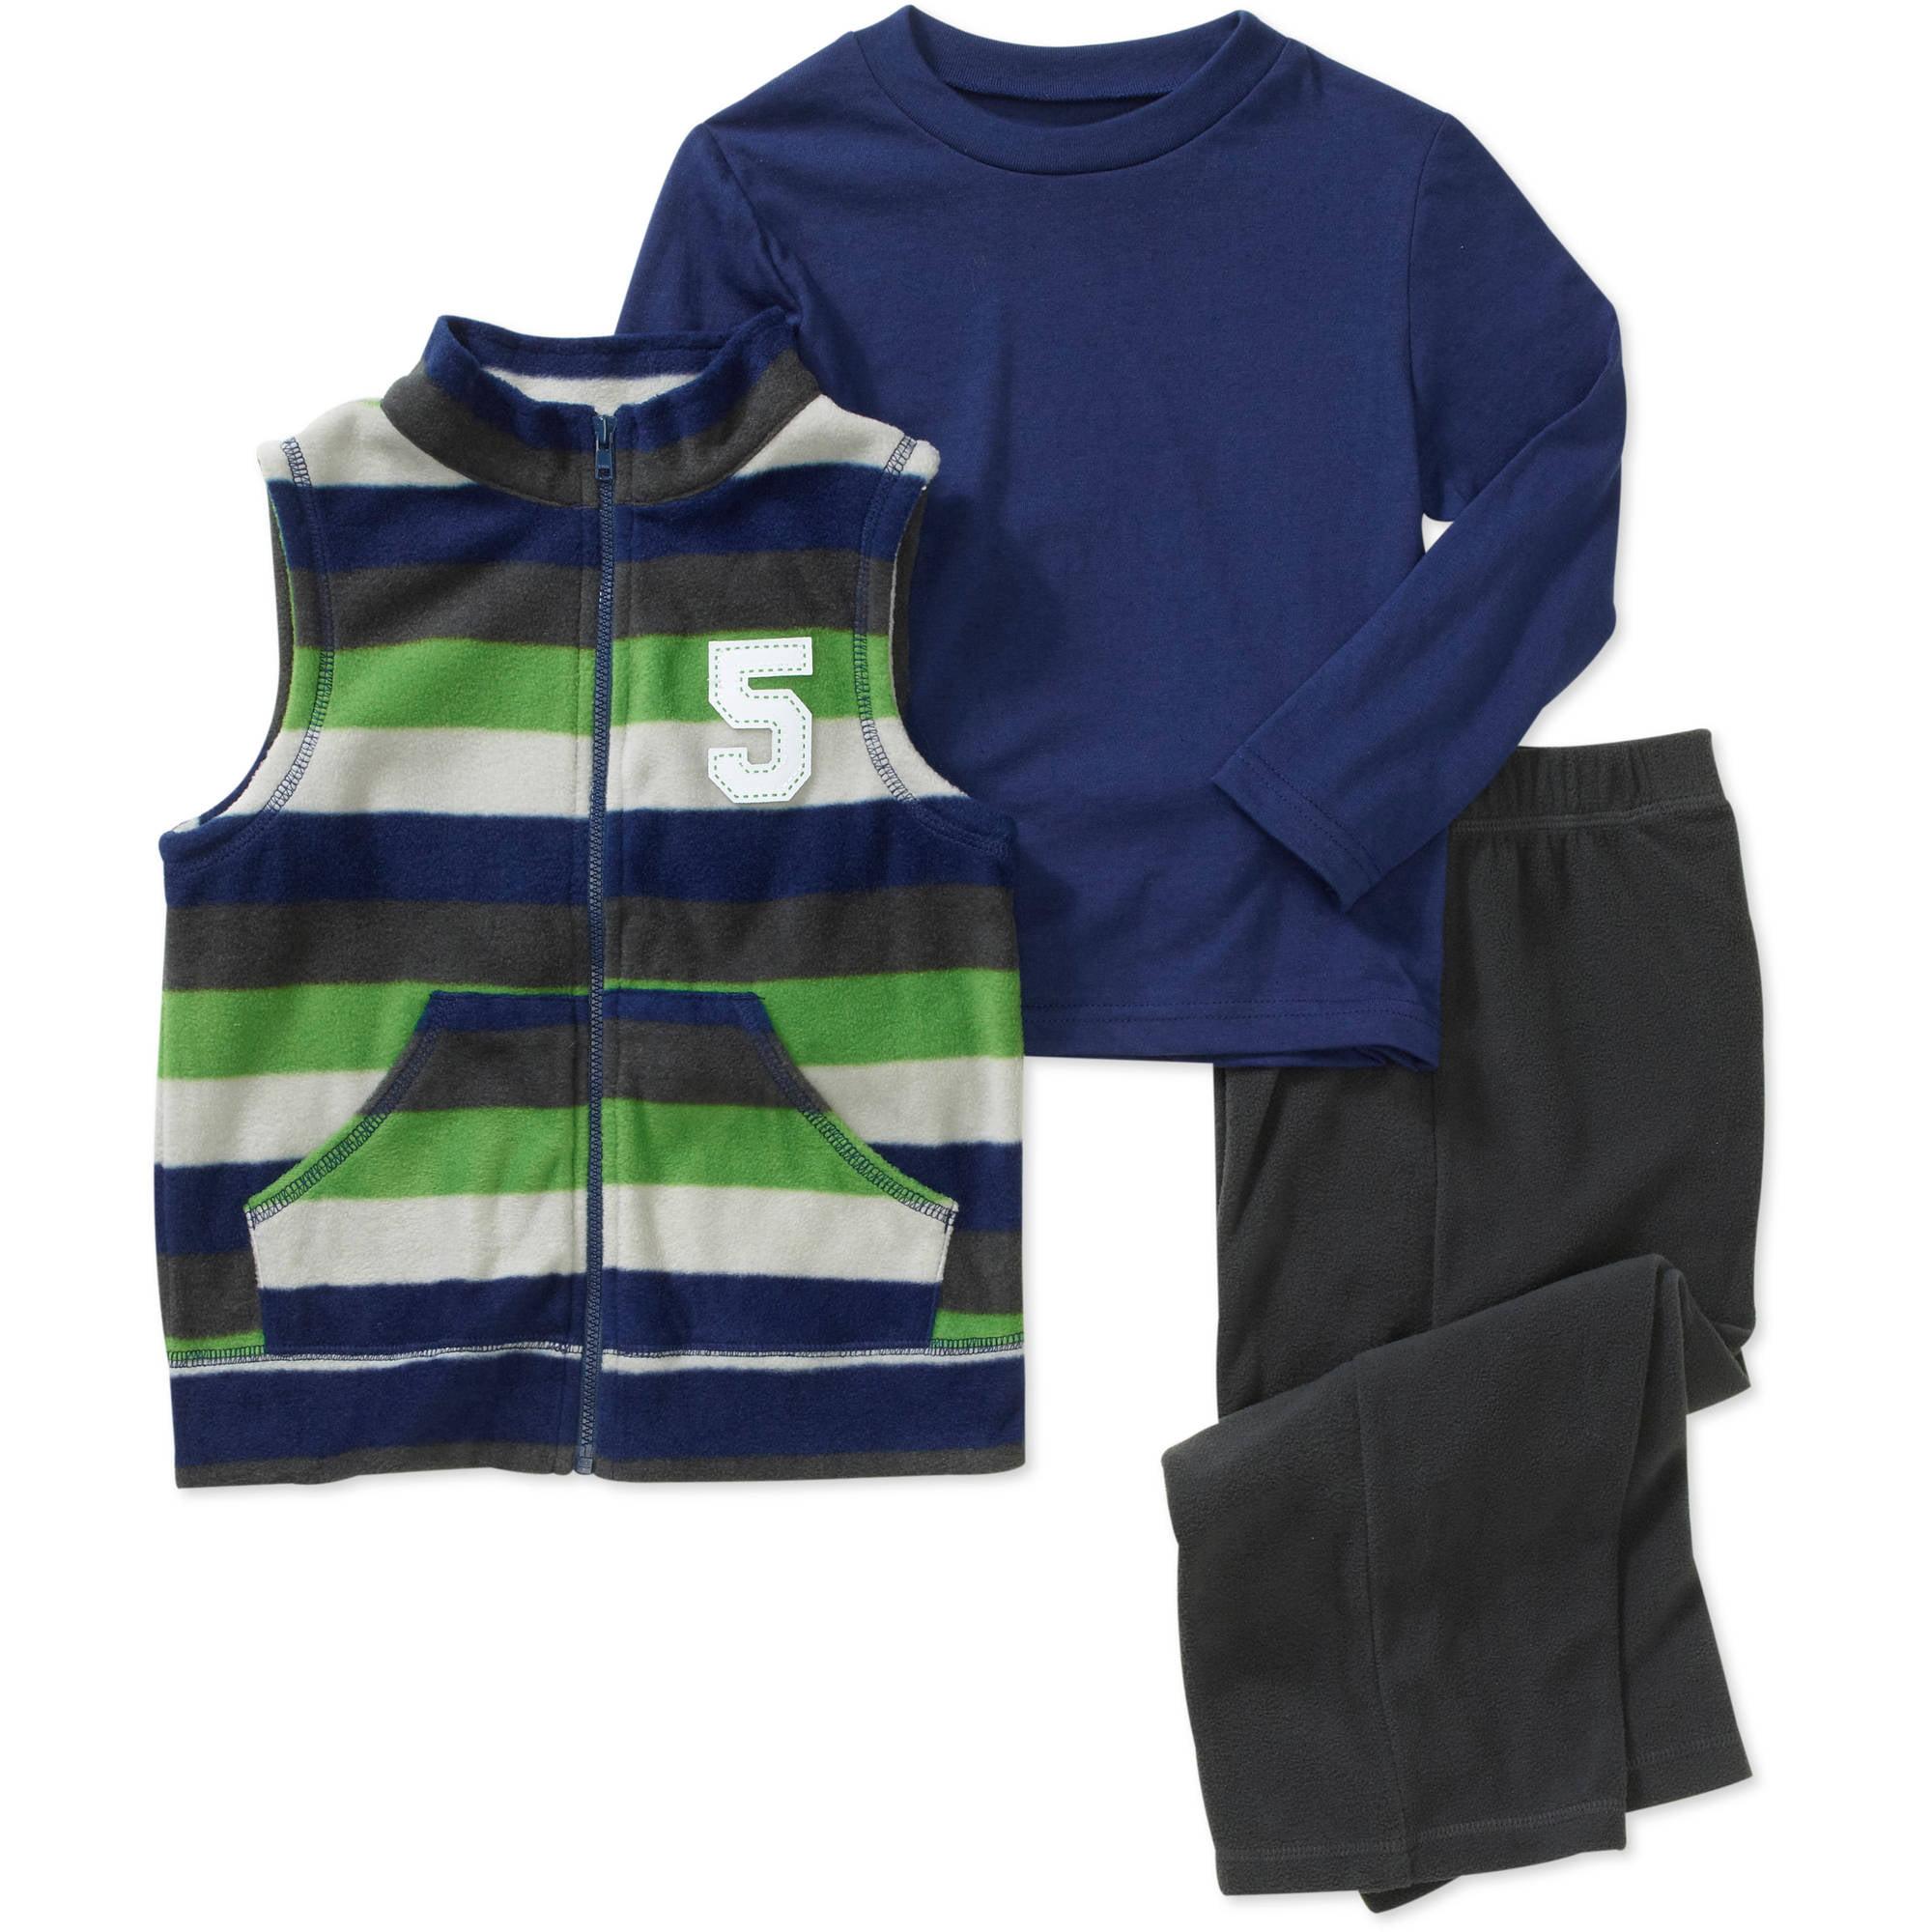 Healthtex Baby Boys' 3-Piece Fleece Vest, Tee and Pant Set